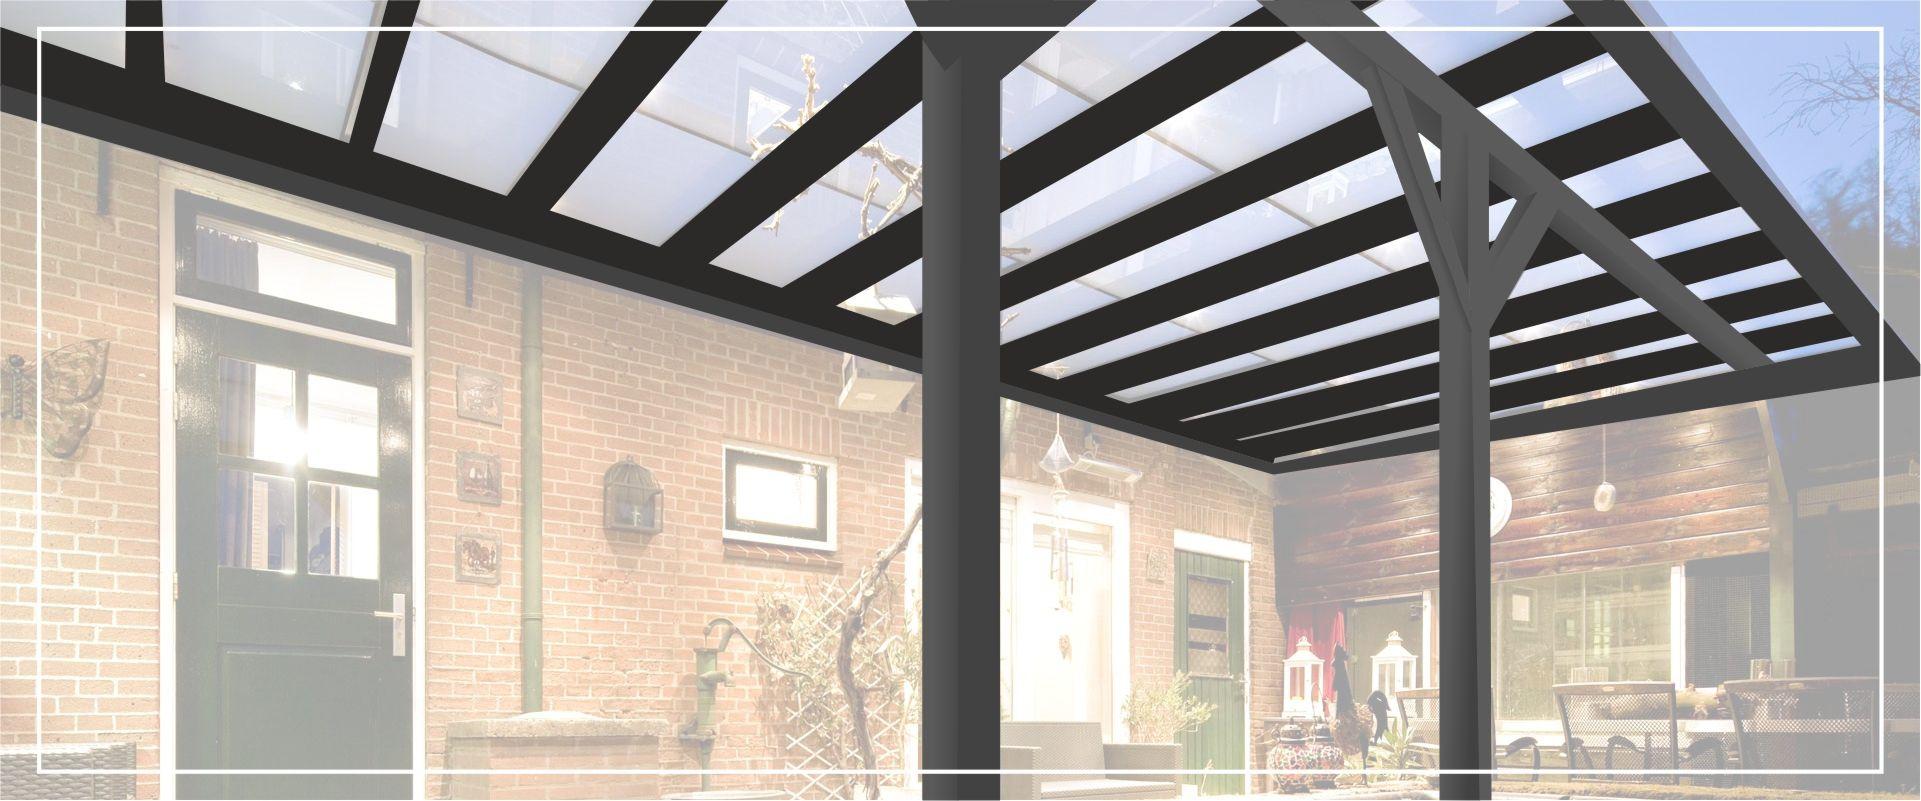 Glasschiebedacher Aus Meschede Uberdachung Terrasse Dach Glasdach